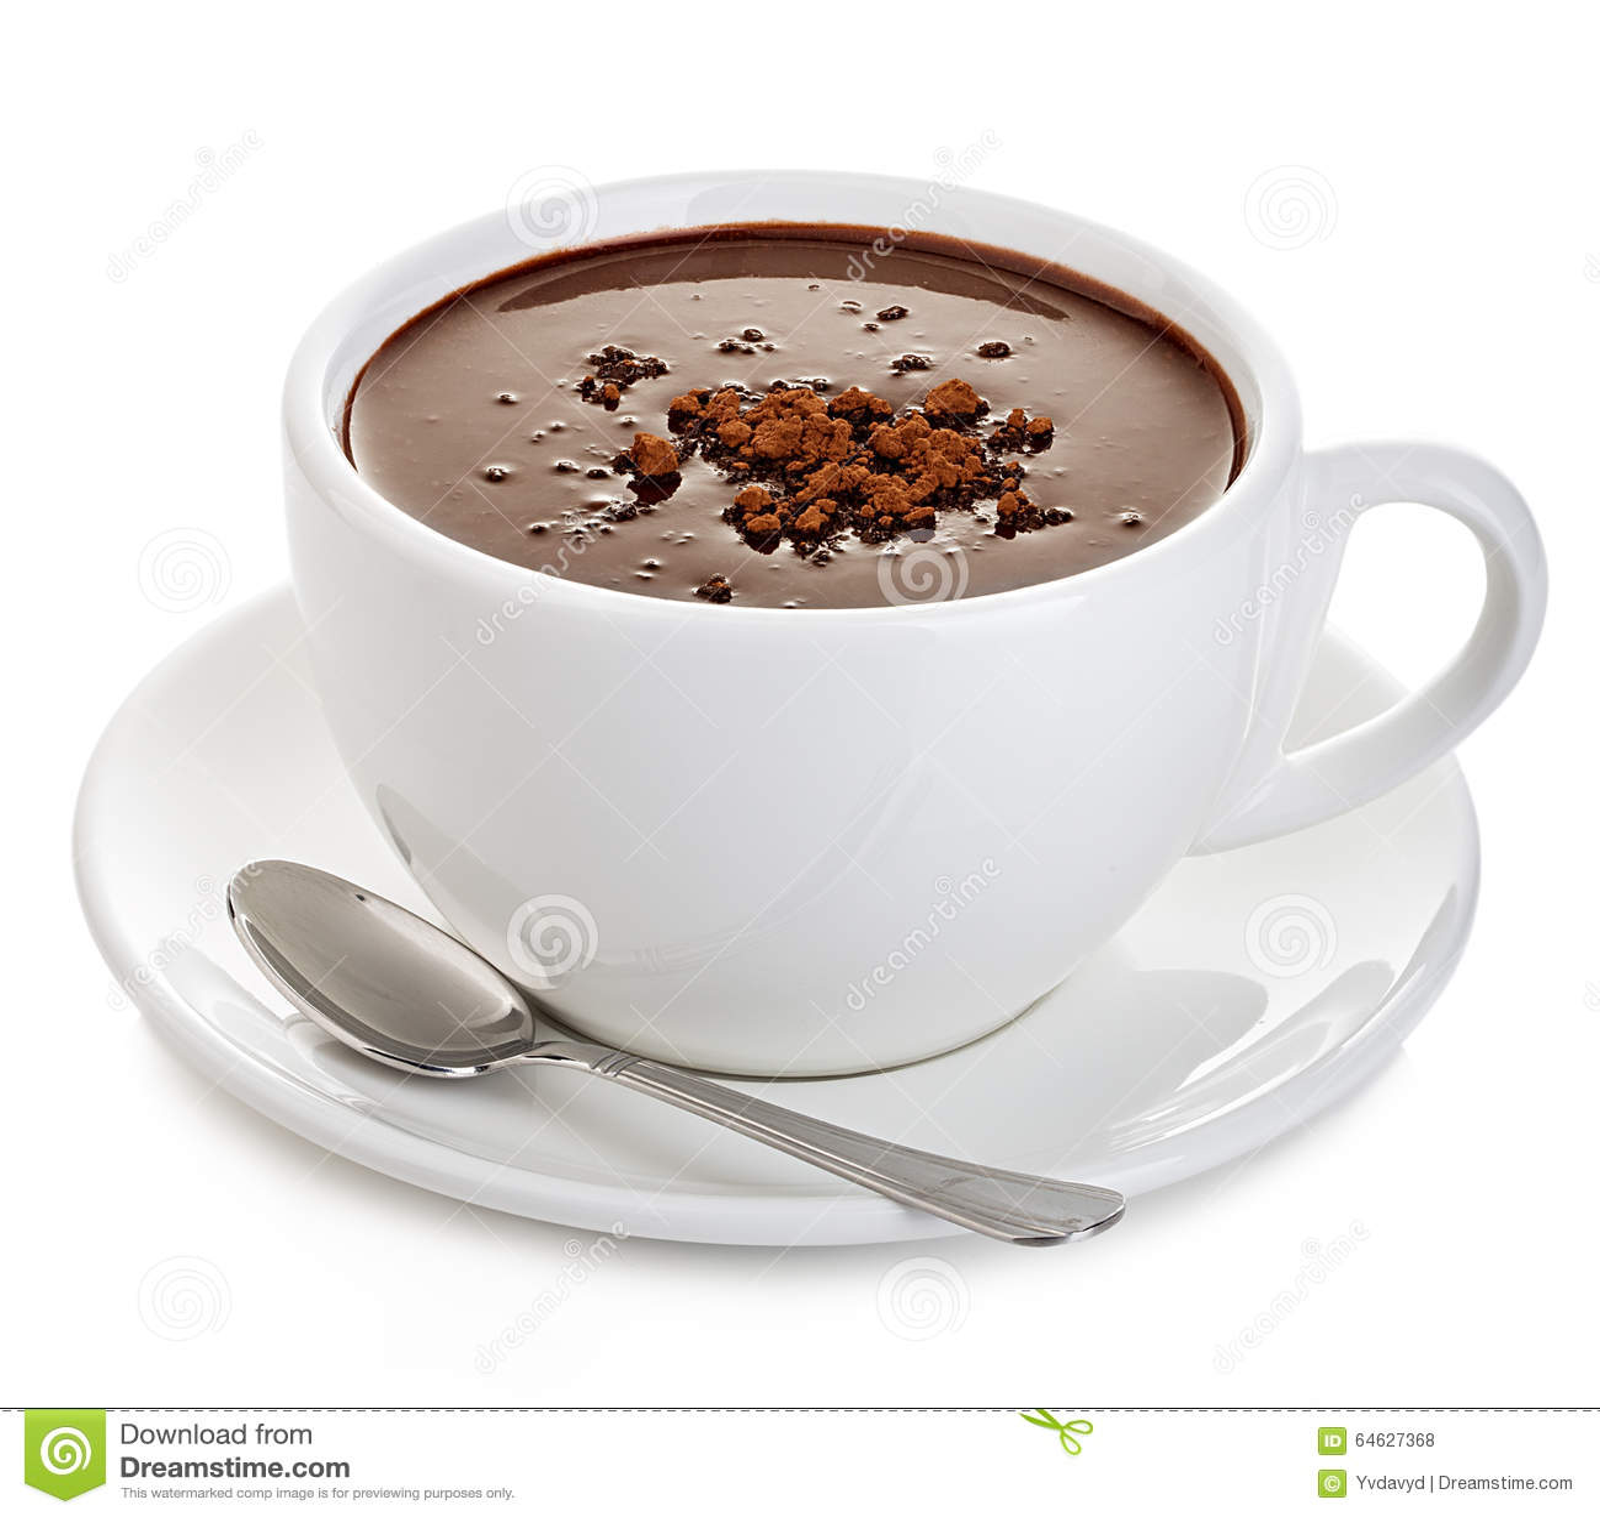 hot coffee white background - photo #9